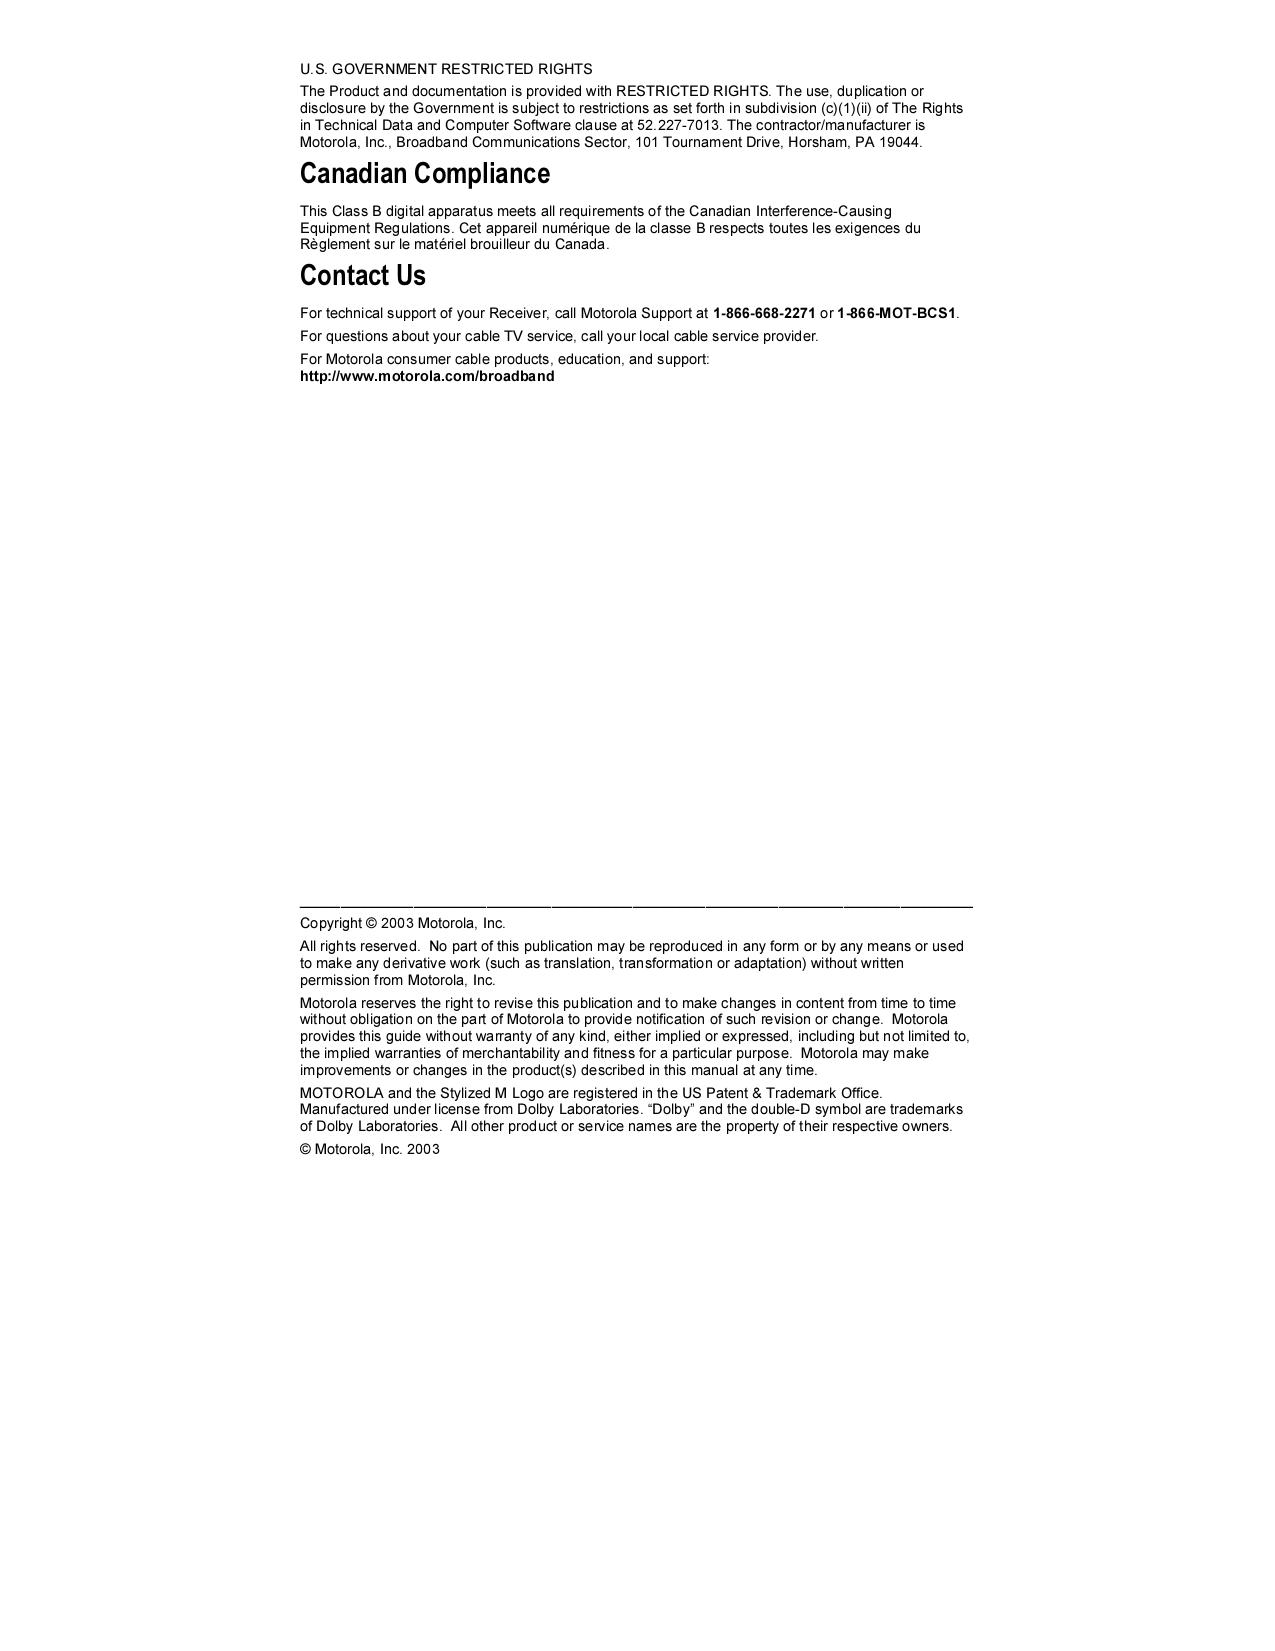 Coreldraw user manual